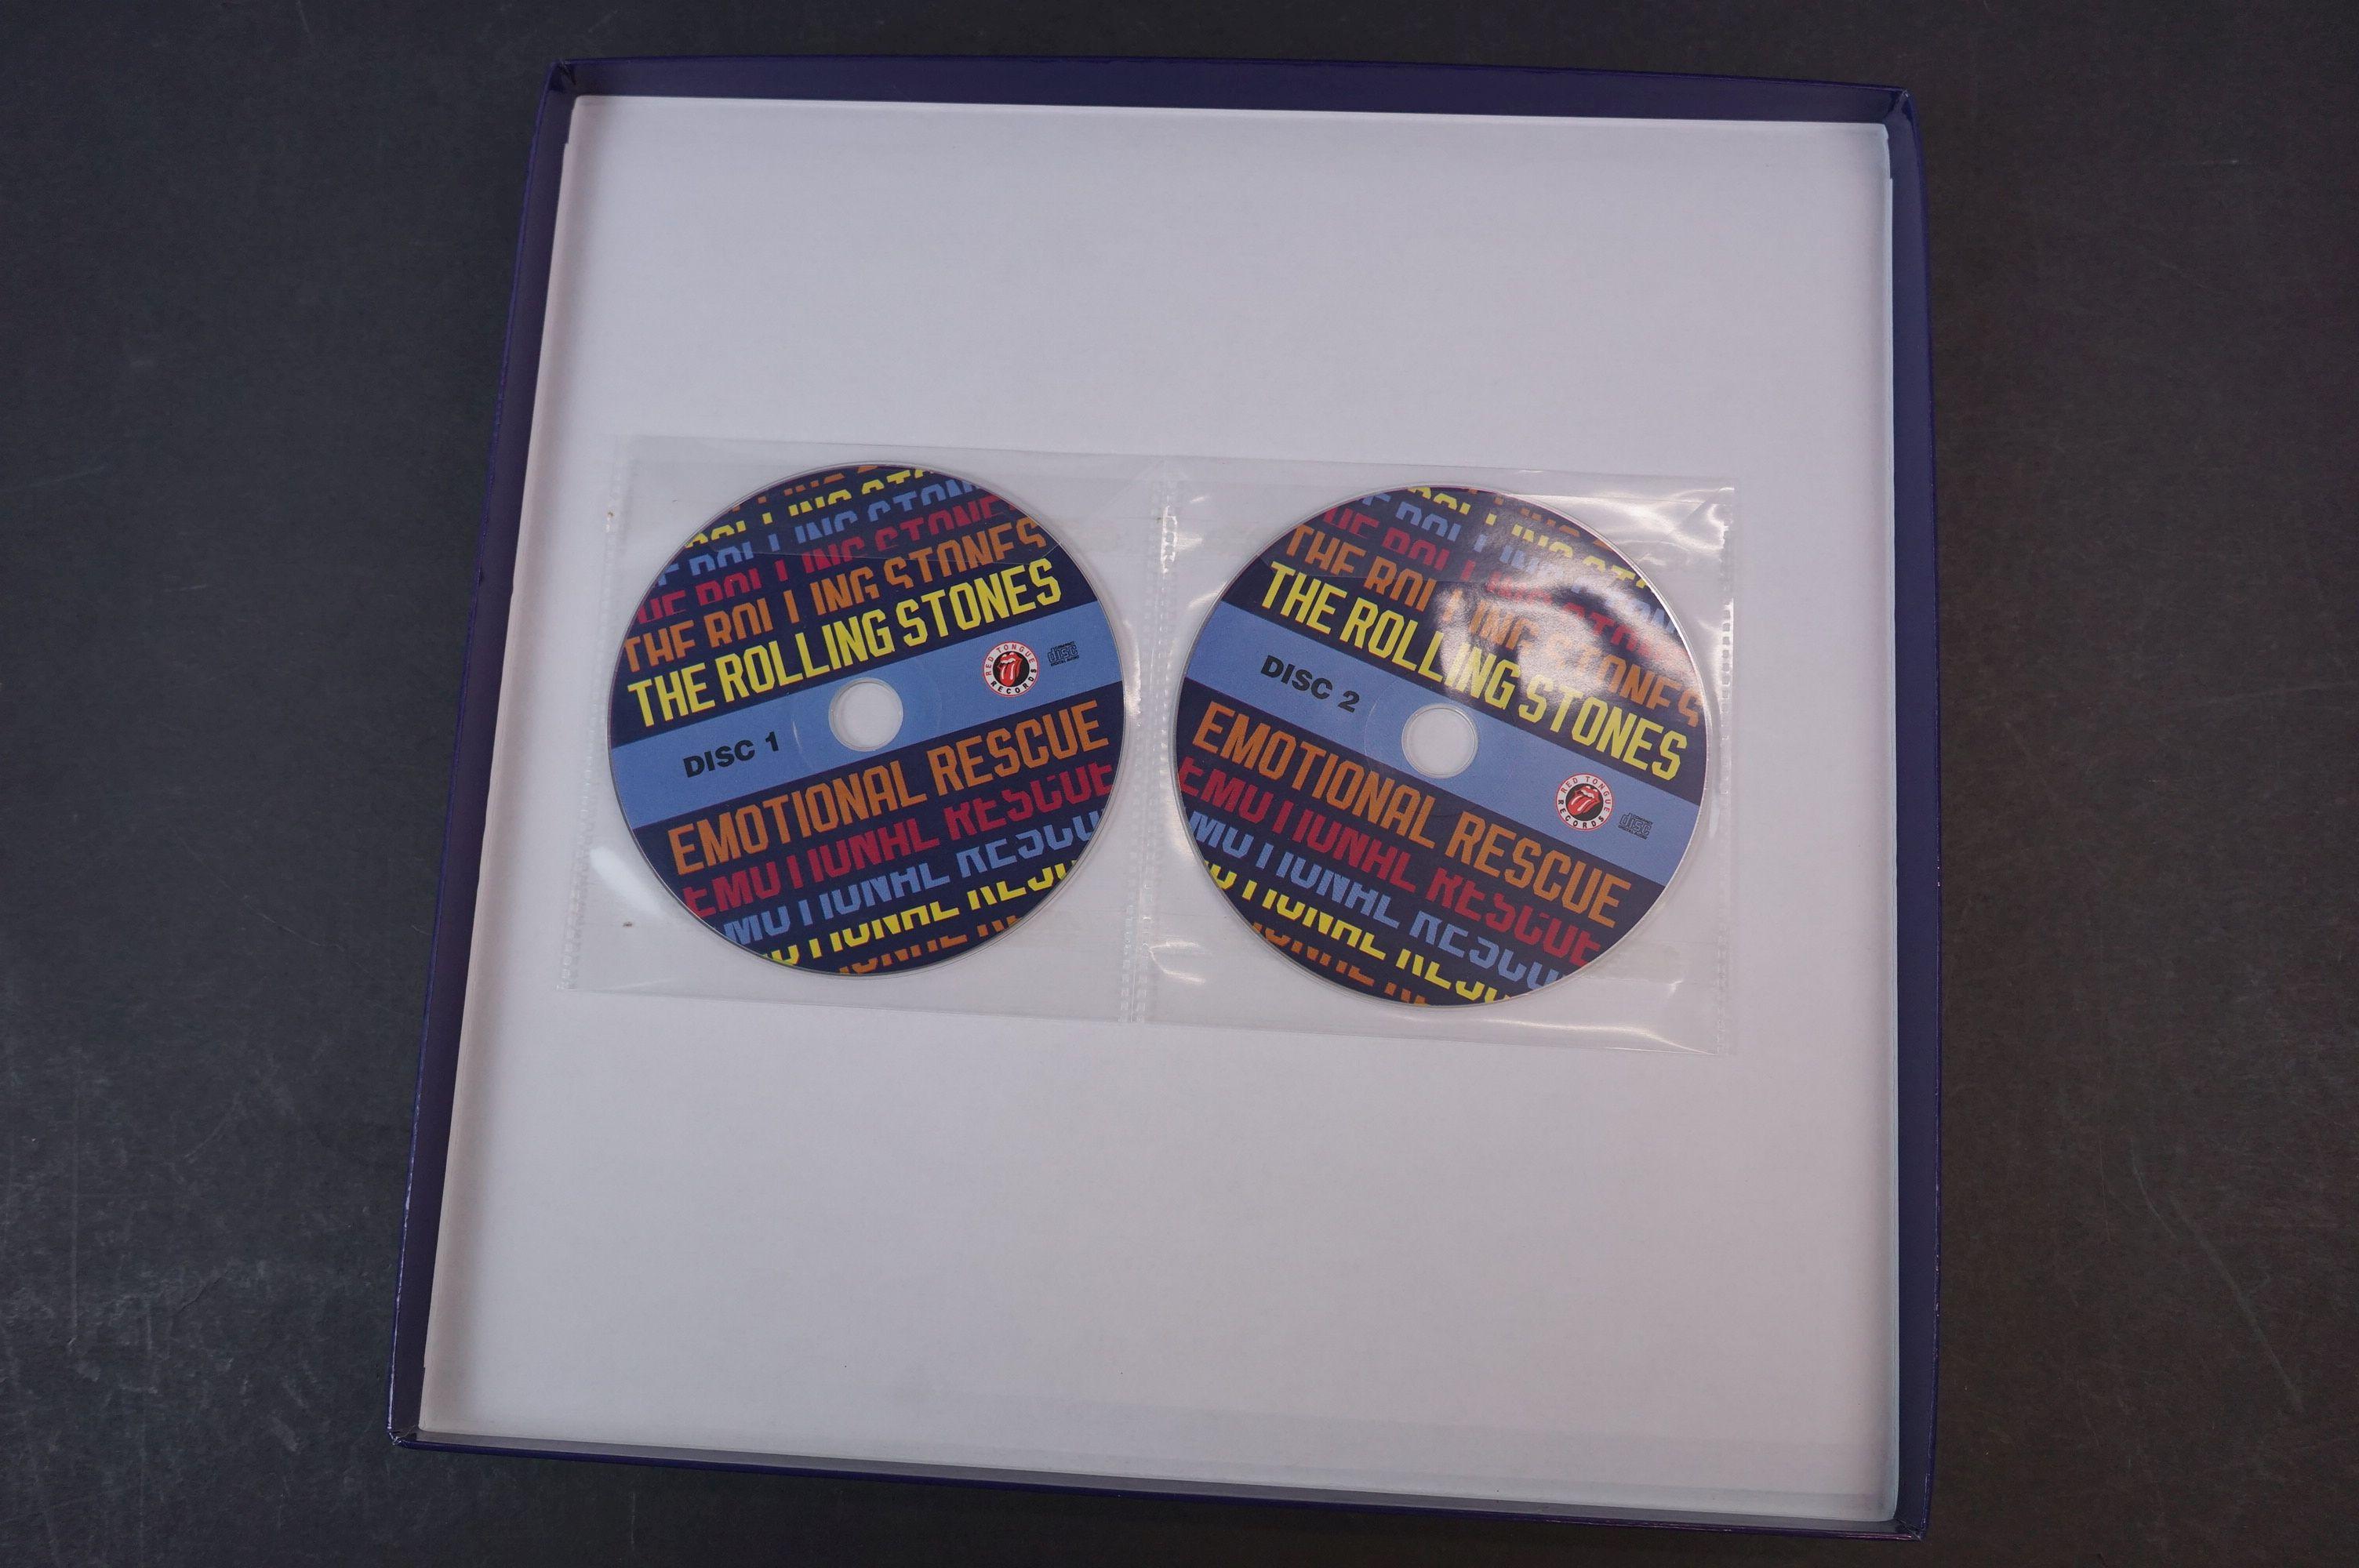 Vinyl - ltd edn The Real Alternate Album Rolling Stones Emotional Rescue 4 LP / 2 CD Box Set, - Image 2 of 12